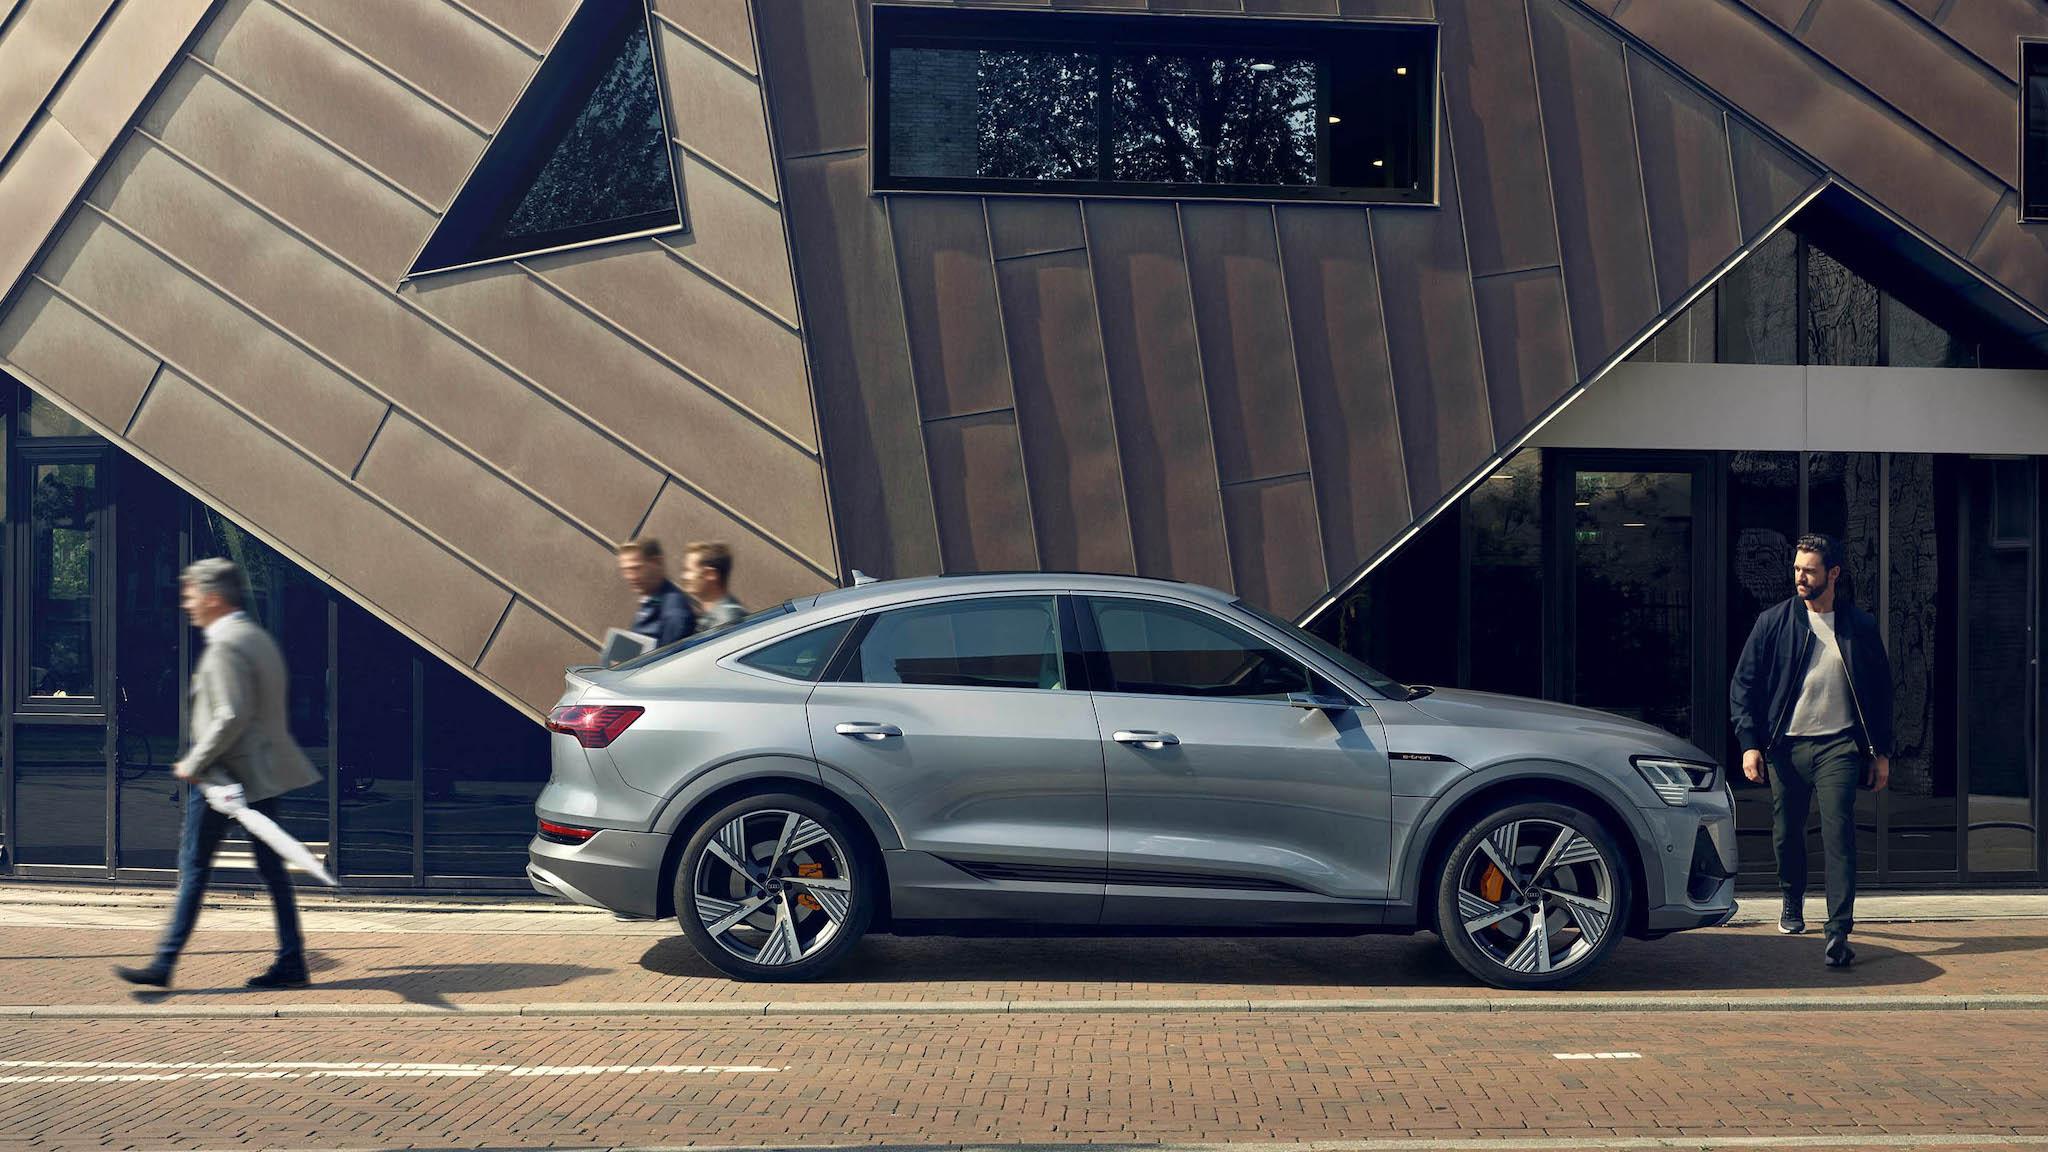 Audi e-tron / e-tron Sportback 預售 289 萬起,充電及保固資訊看這裡